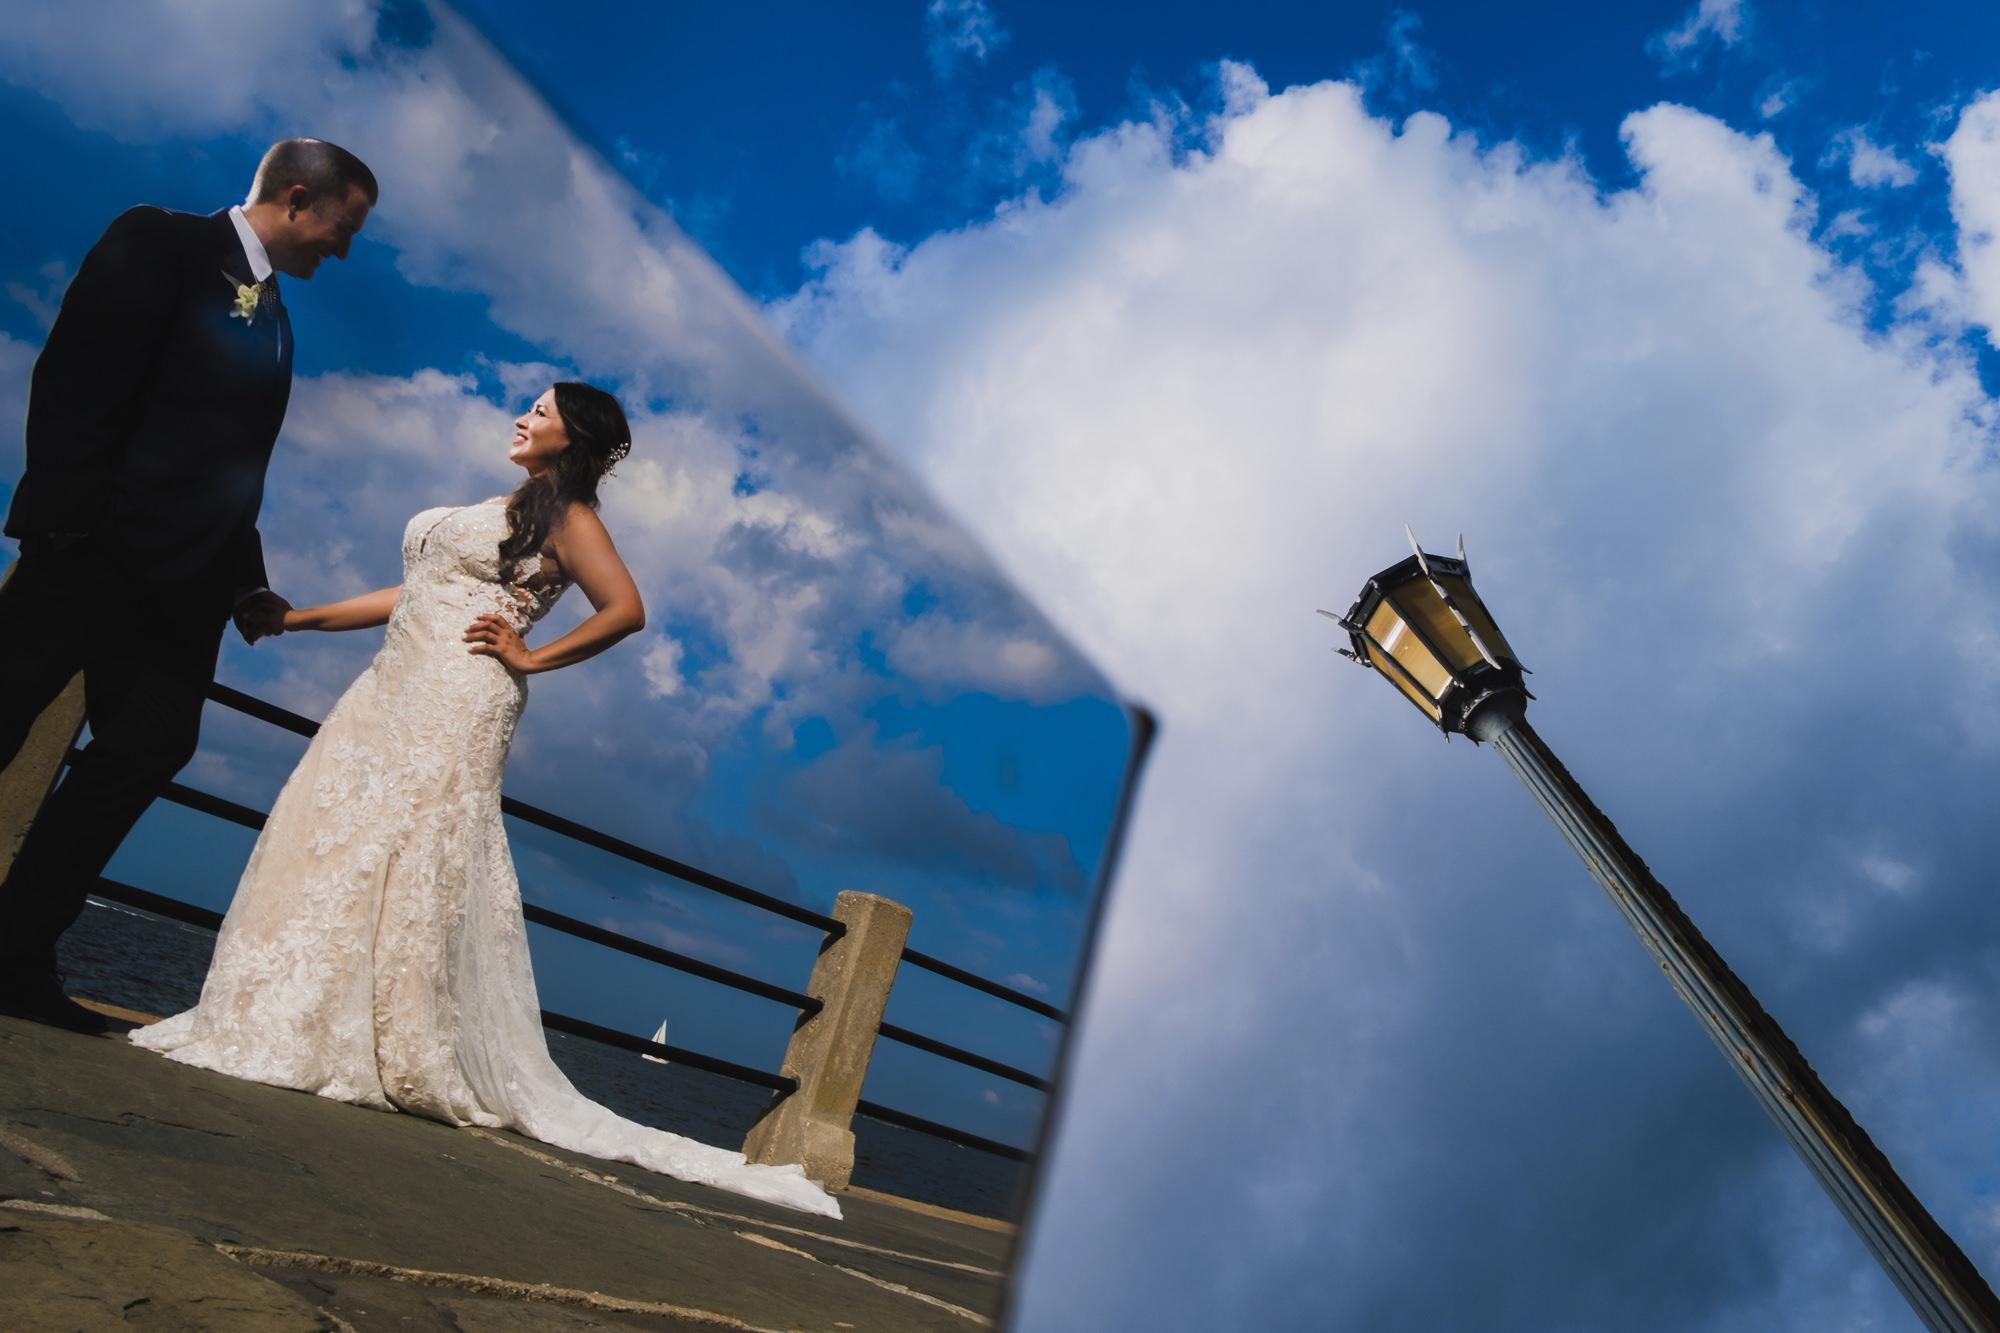 Bride and groom reflected against mirror under streetlight - photo by Chrisman Studios - Charleston